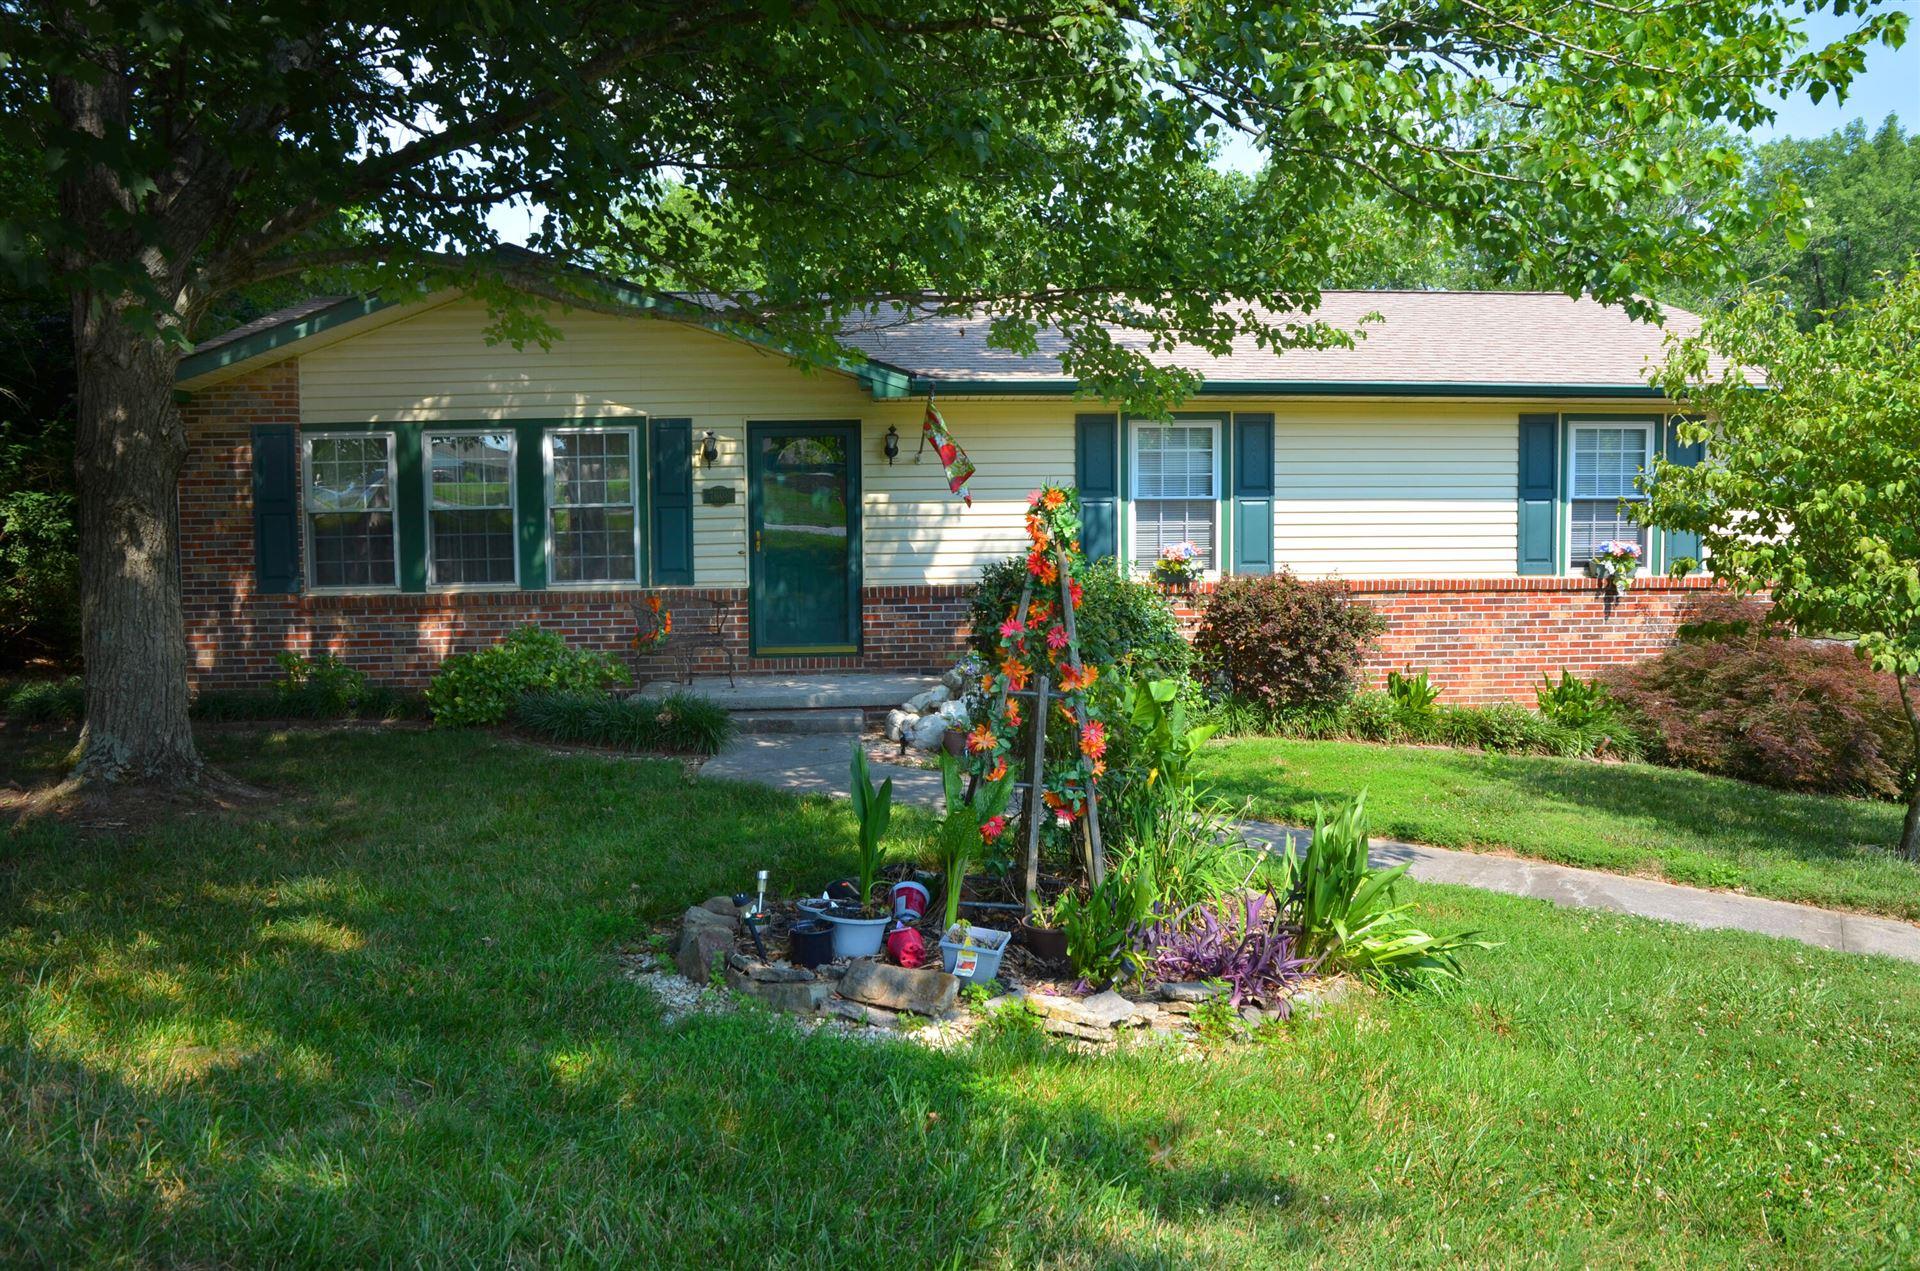 Photo of 7608 Berkshire Blvd, Powell, TN 37849 (MLS # 1159584)